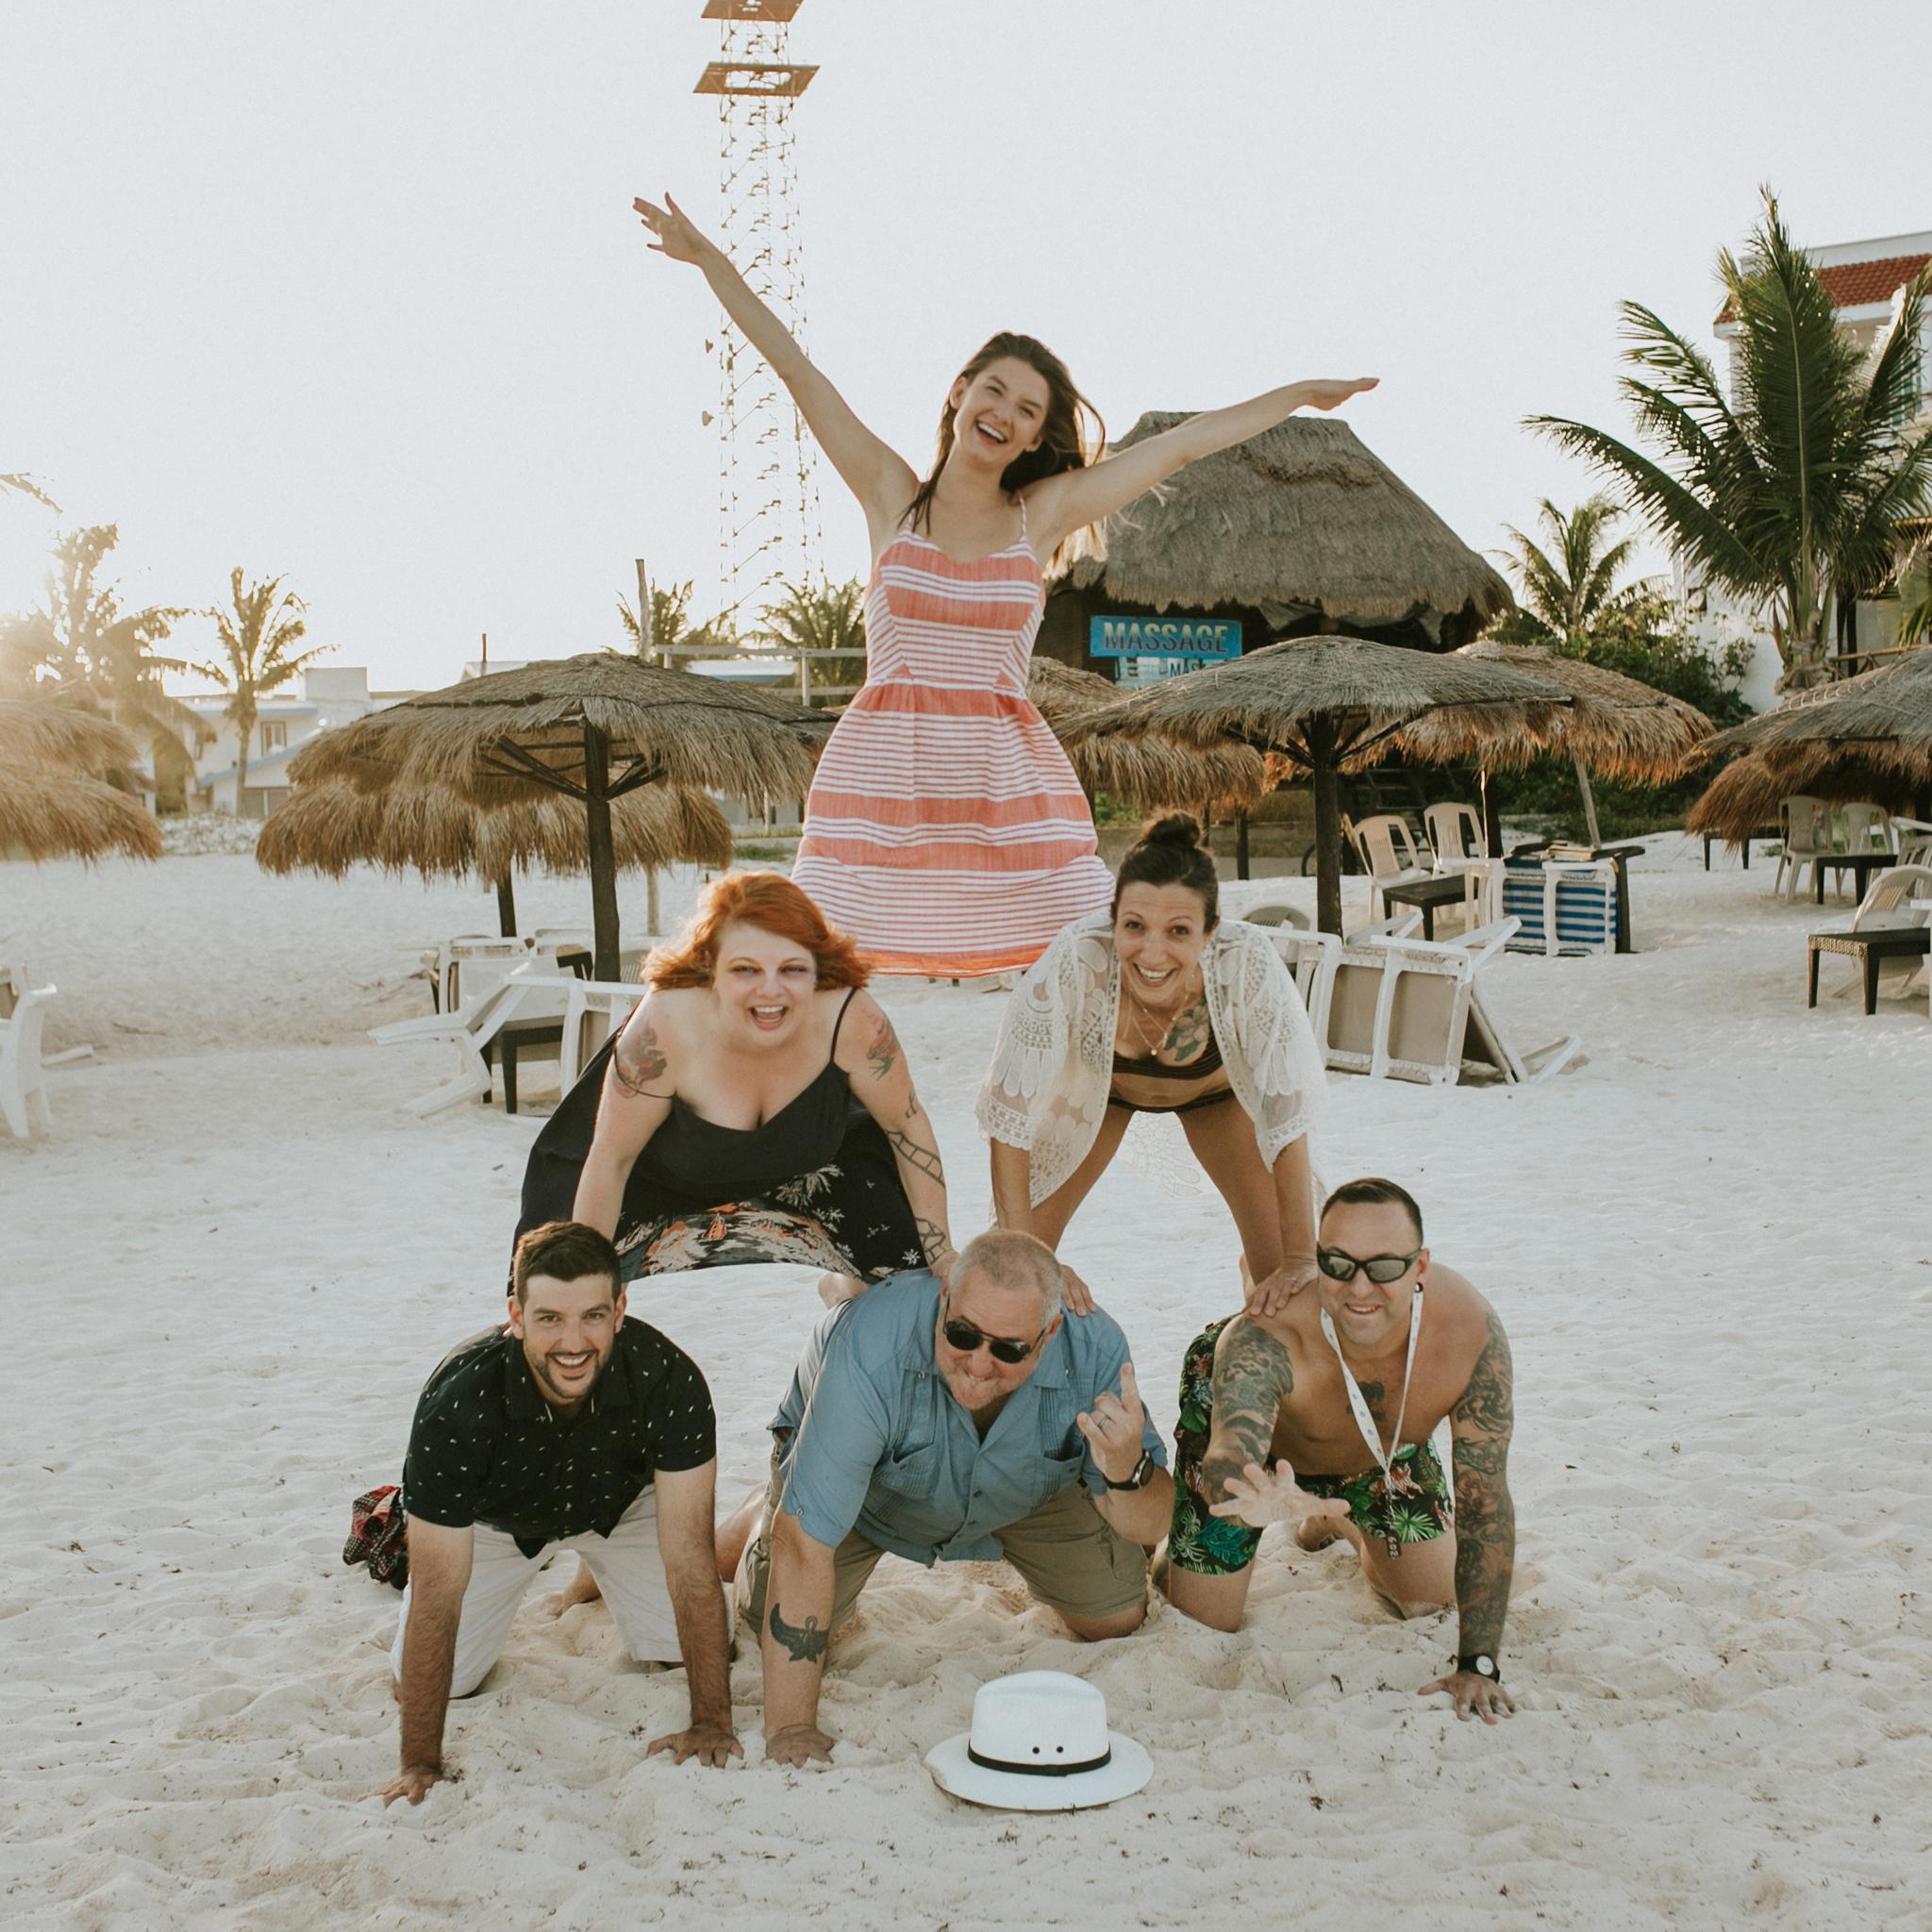 cancun-07-13-2019-family-trip-26_original.jpg